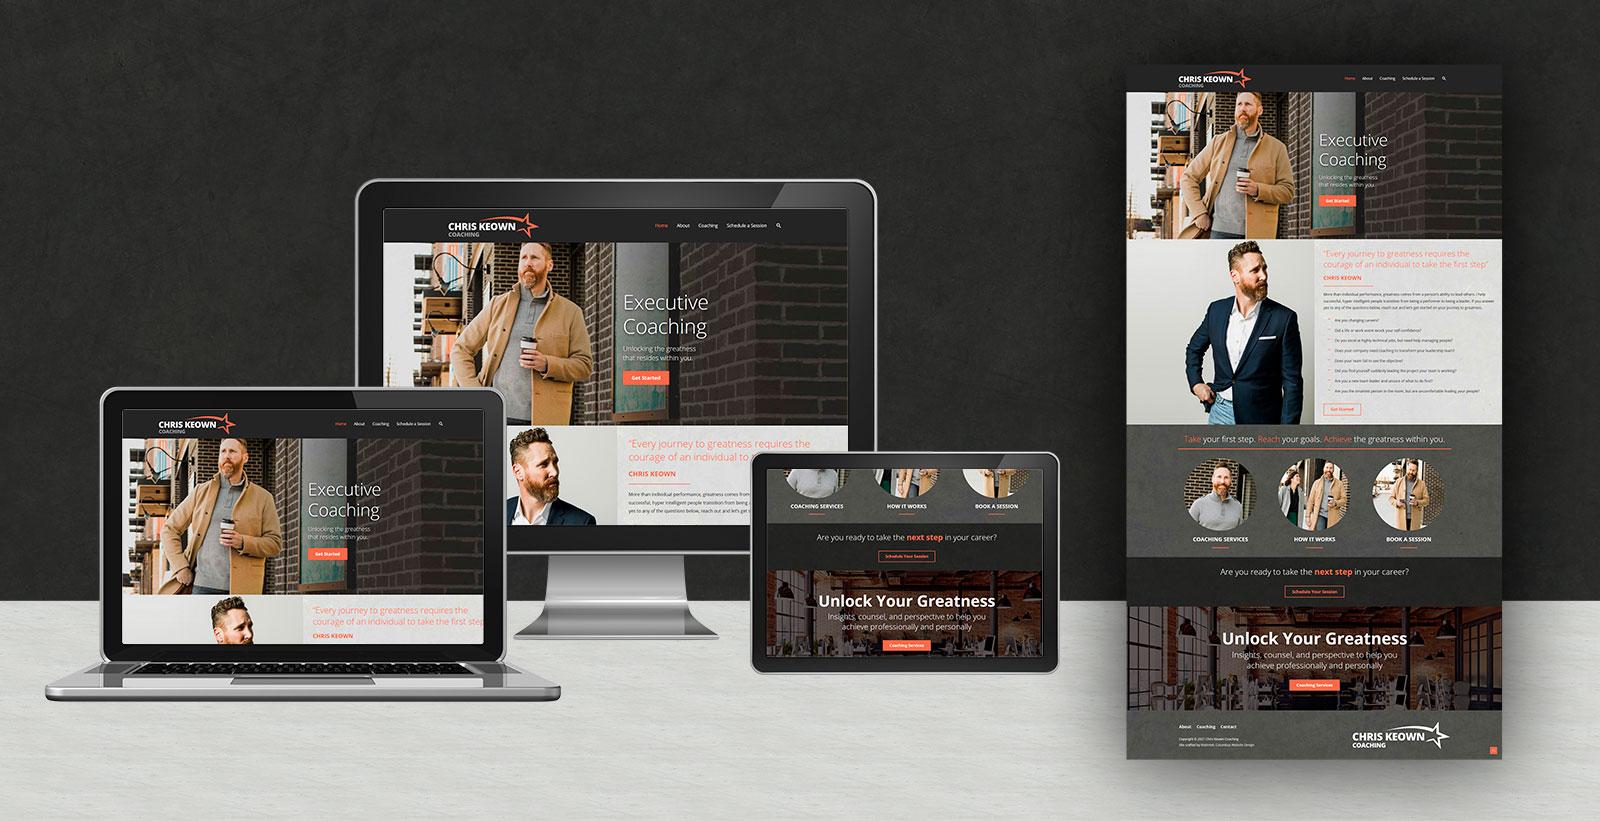 responsive website design for Chris Keown